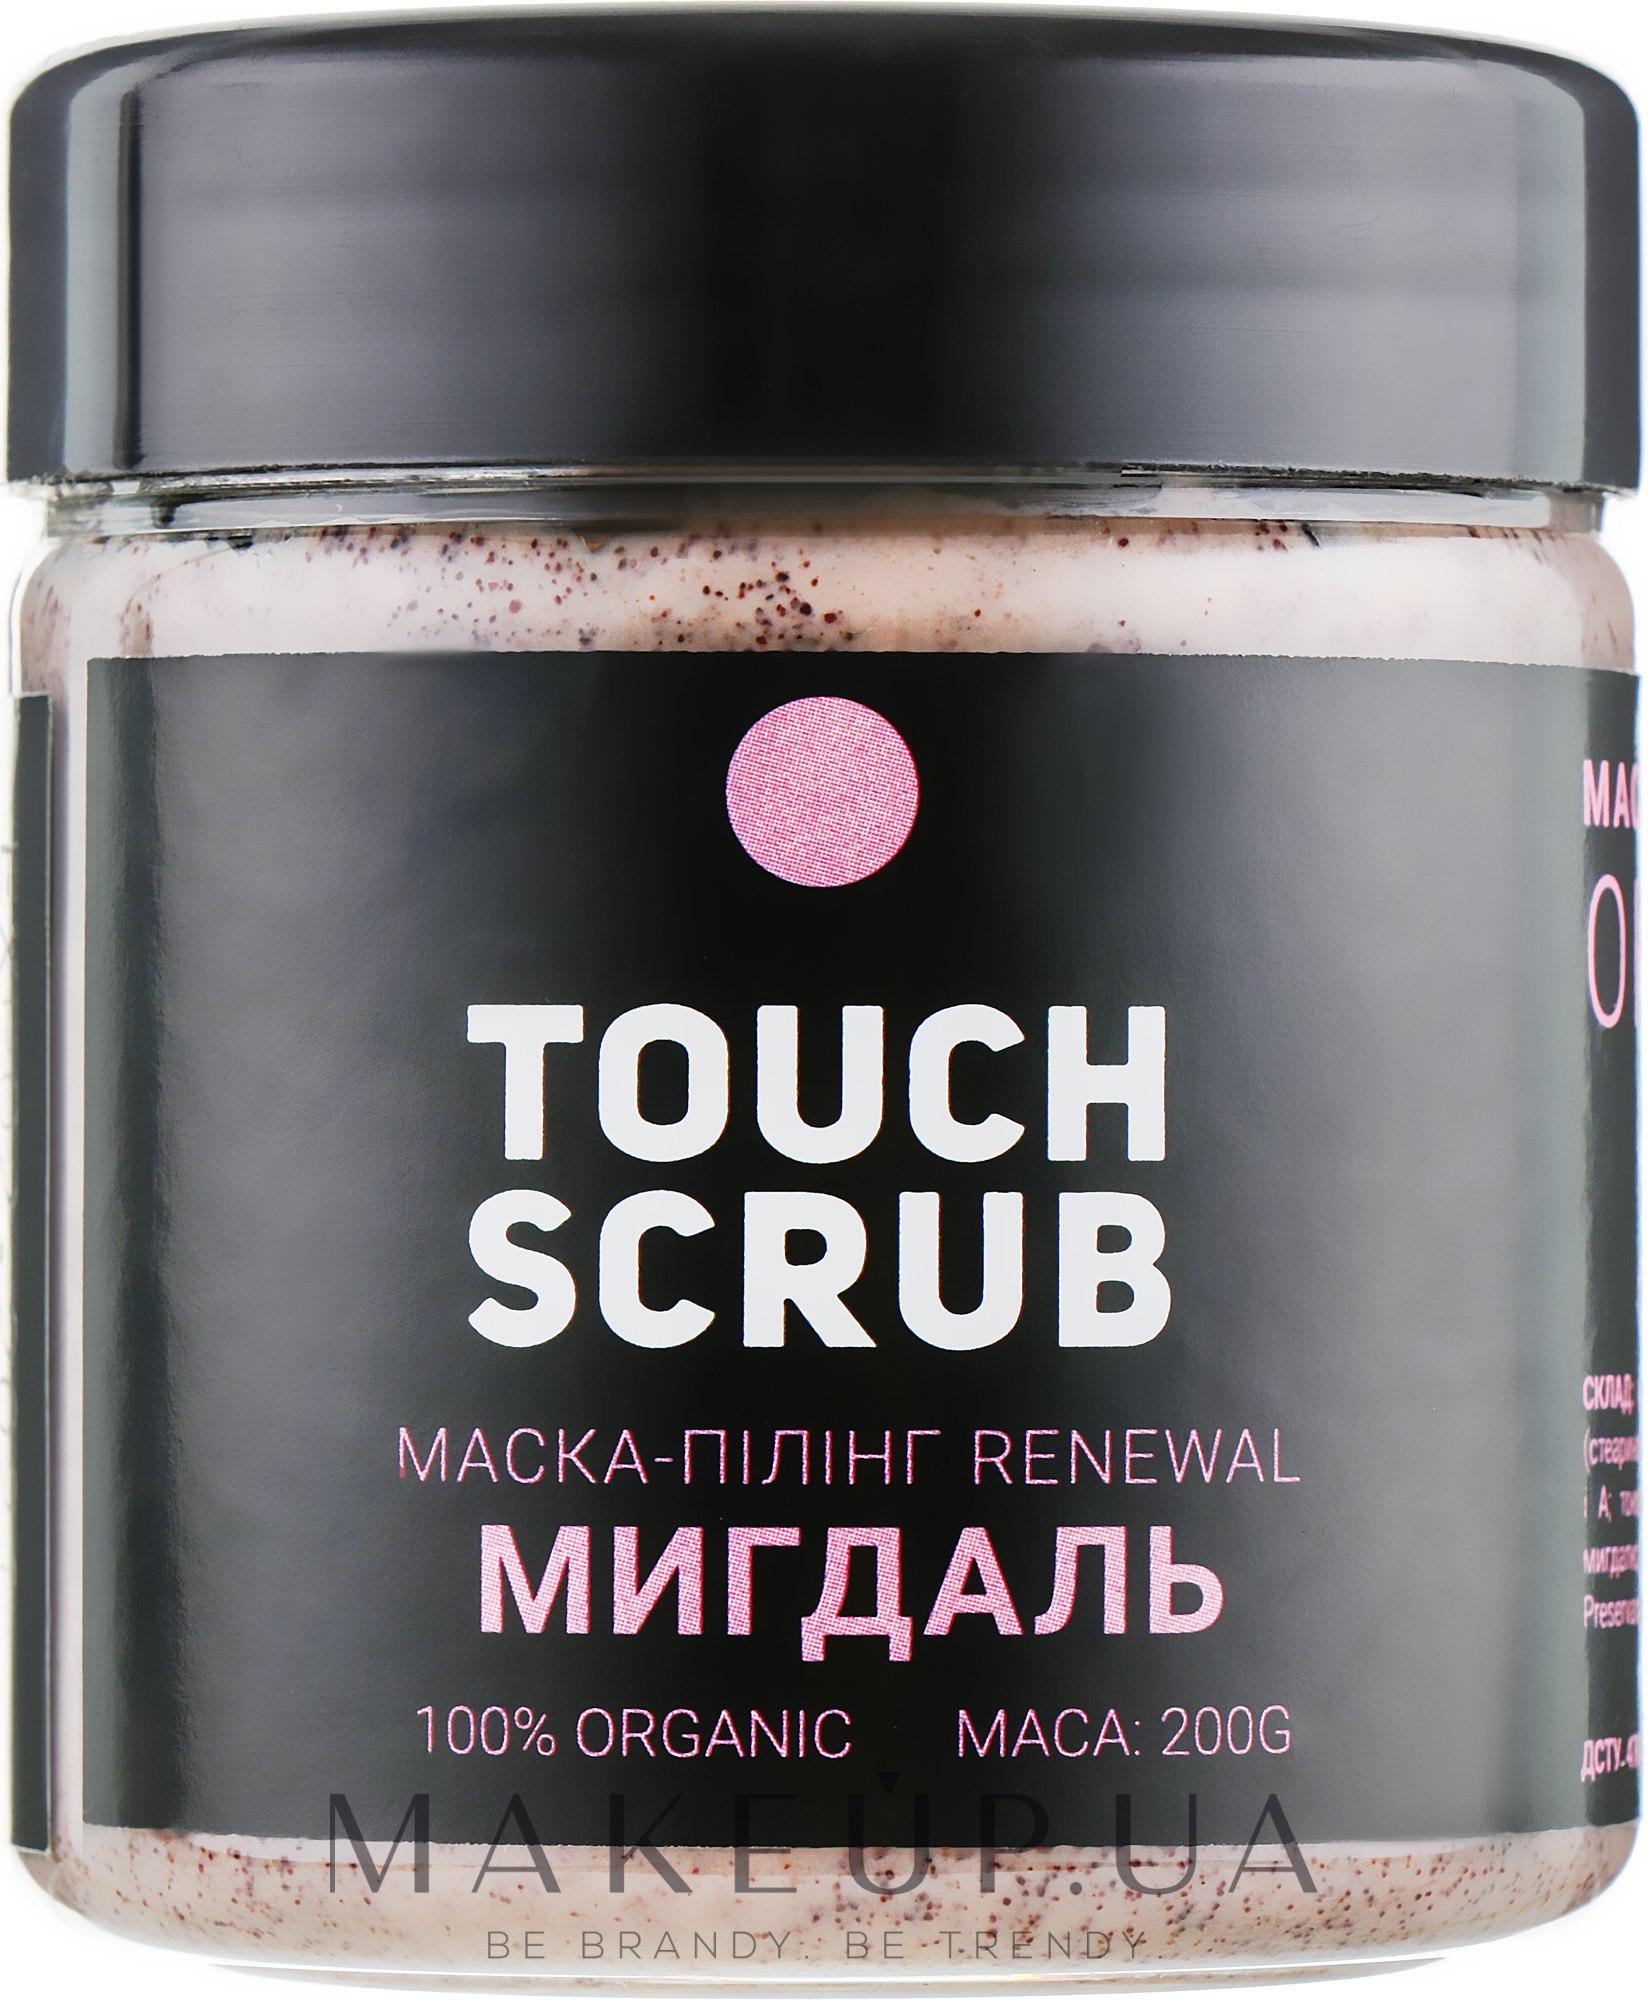 "Маска-пилинг для лица ""Миндаль"" - Touch — фото 200g"